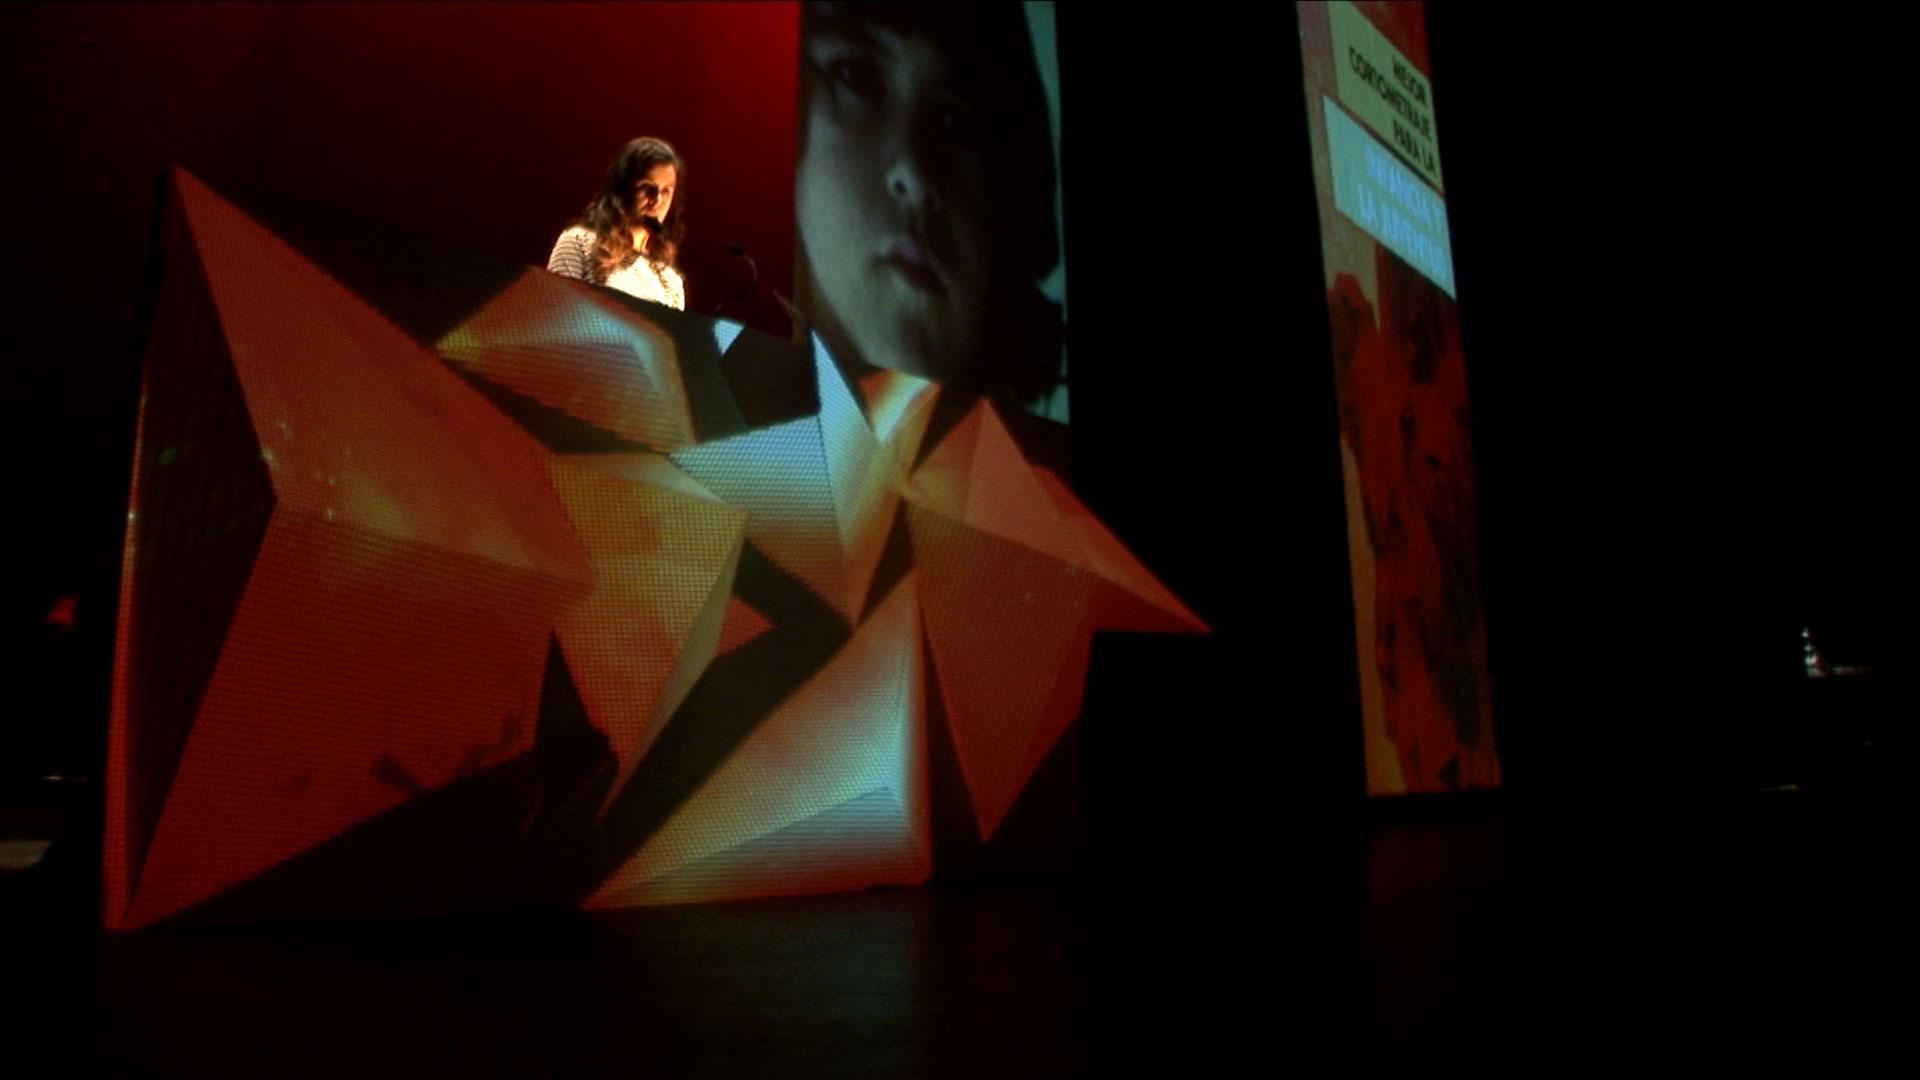 XXI Festival Internacional de Jóvenes Realizadores